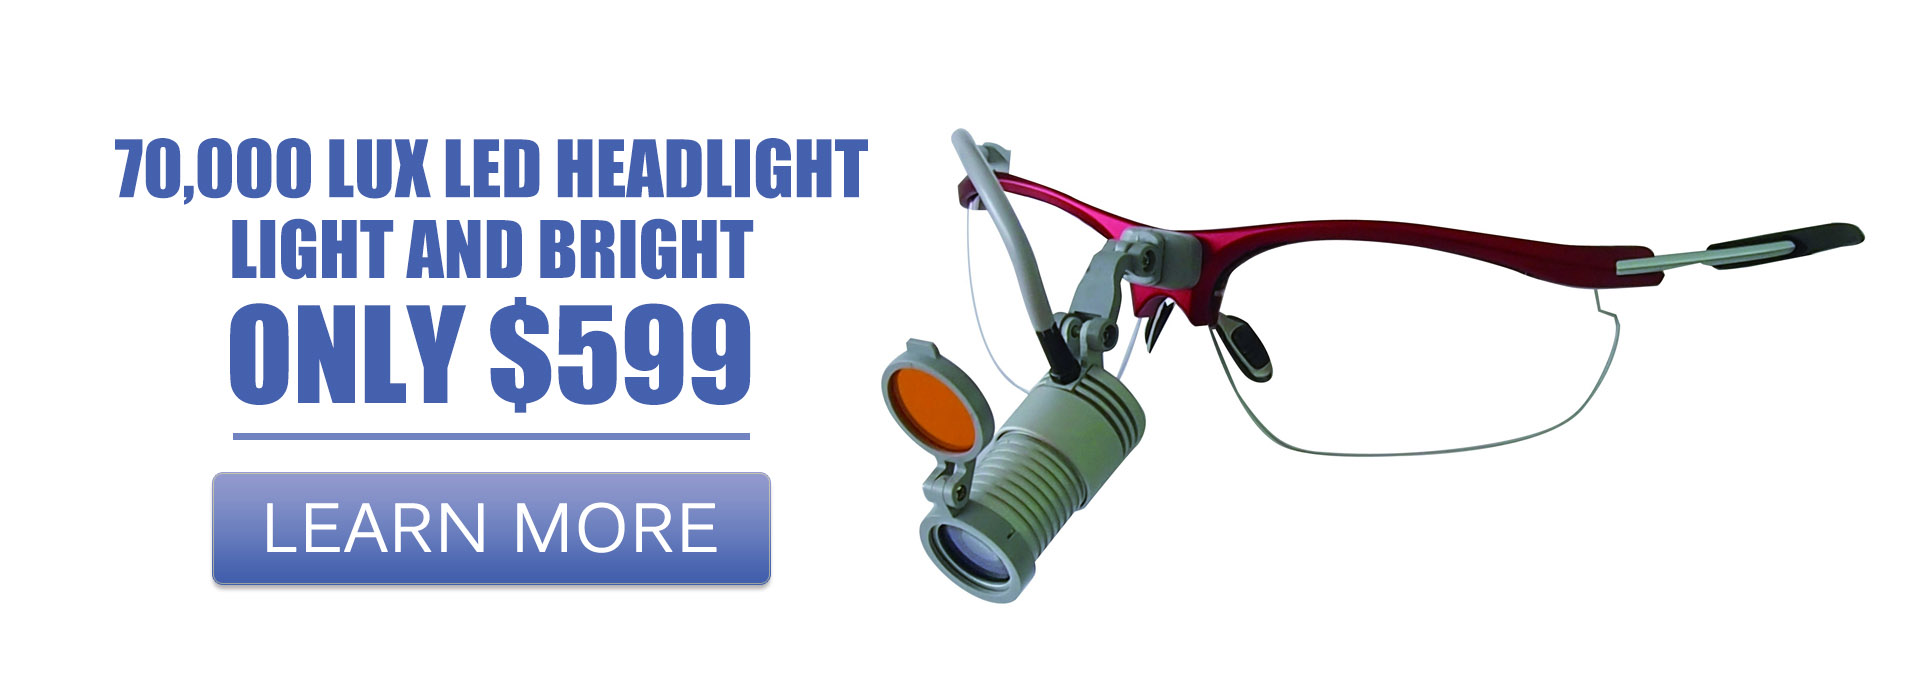 Lux Led Headlights